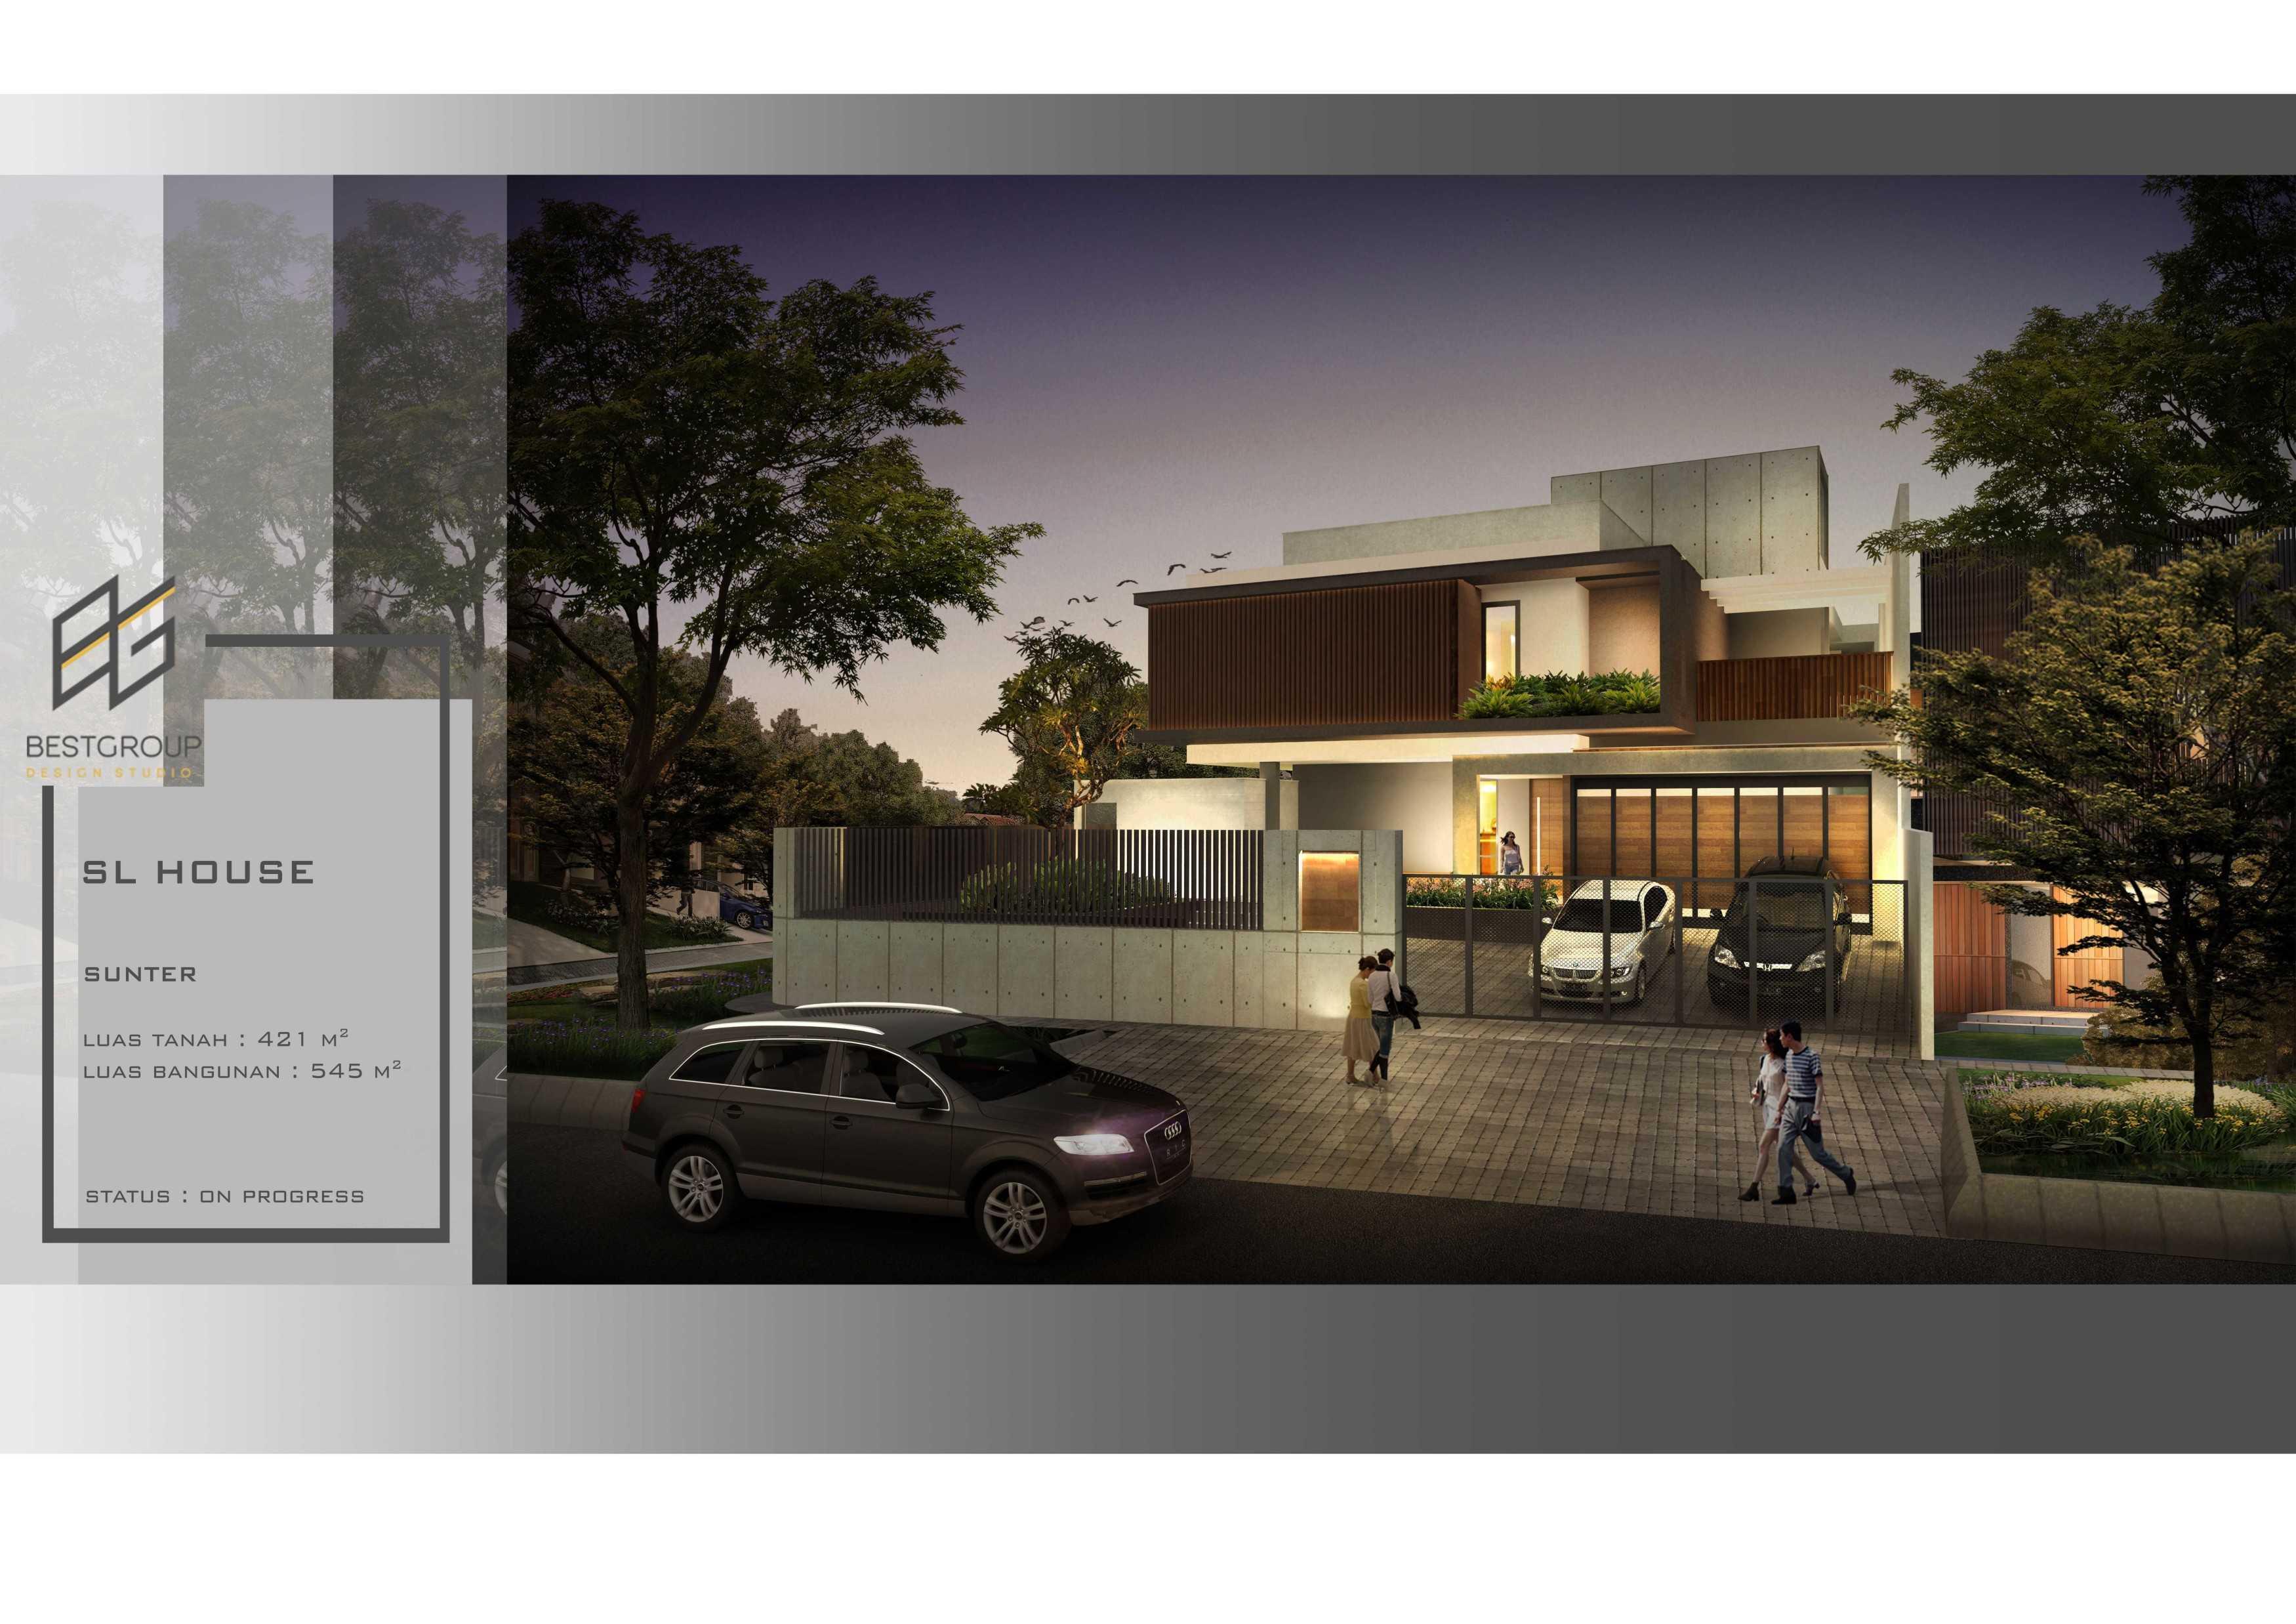 Best Group Design Studio Sl House Daerah Khusus Ibukota Jakarta, Indonesia Daerah Khusus Ibukota Jakarta, Indonesia Best-Group-Design-Studio-Sl-House Industrial  63836